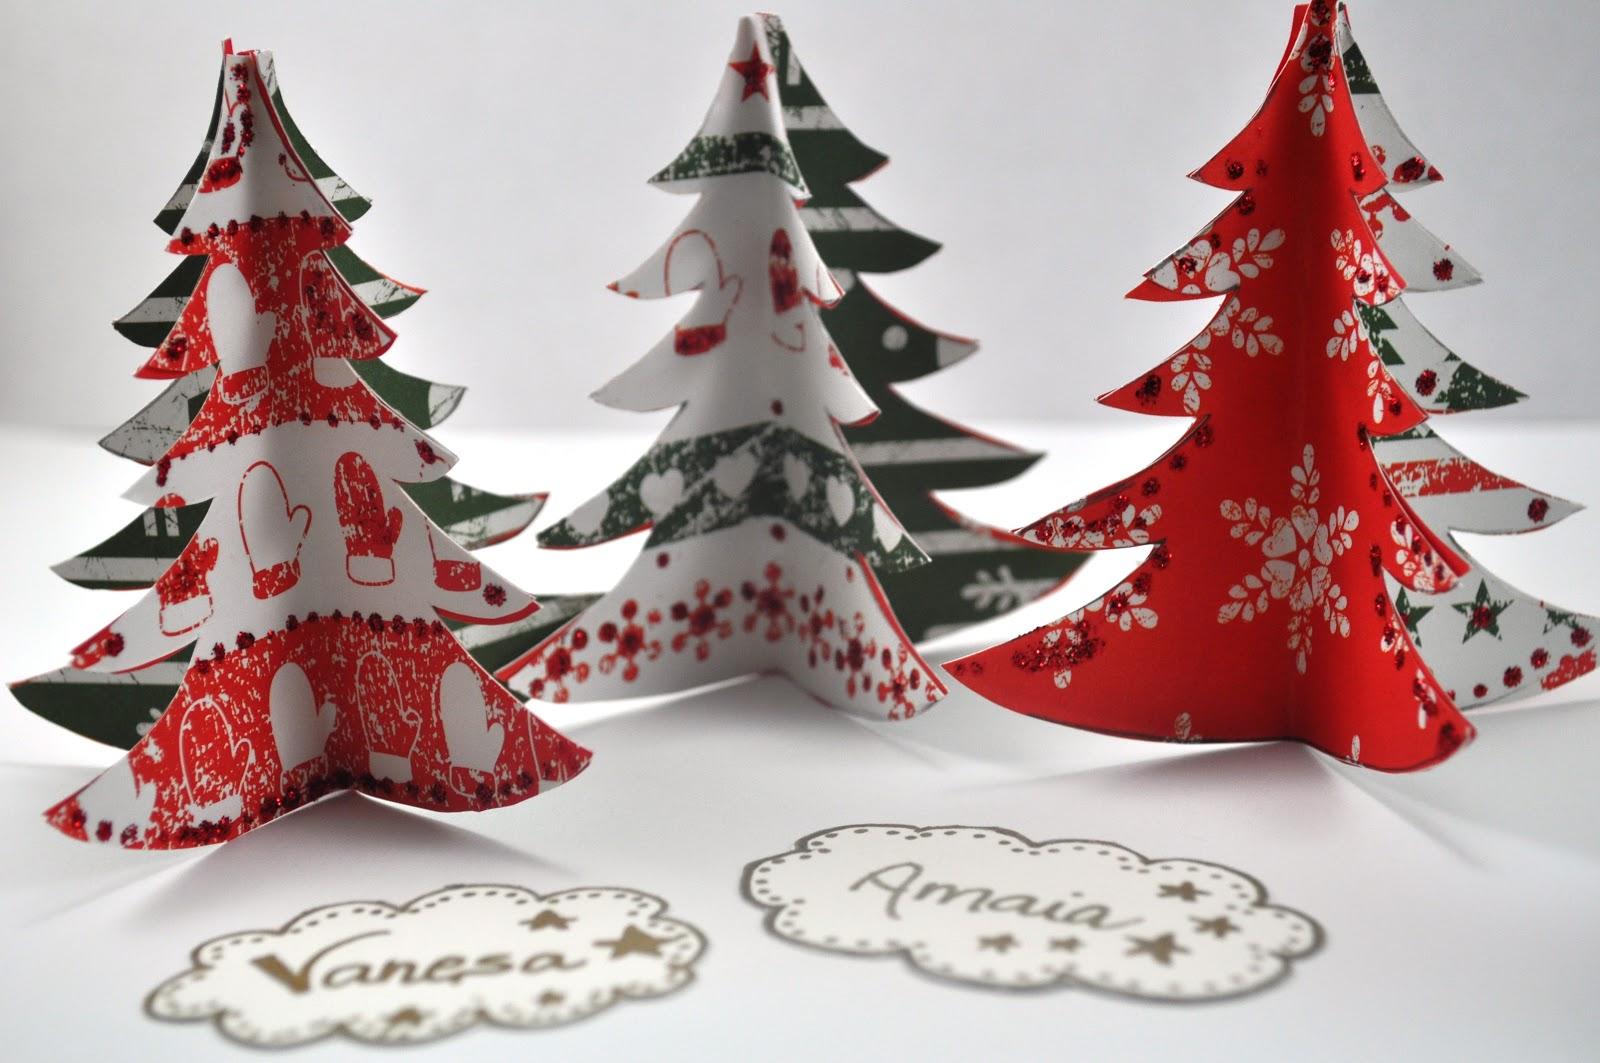 Los mejores adornos navide os para decorar for Disenos navidenos para decorar puertas